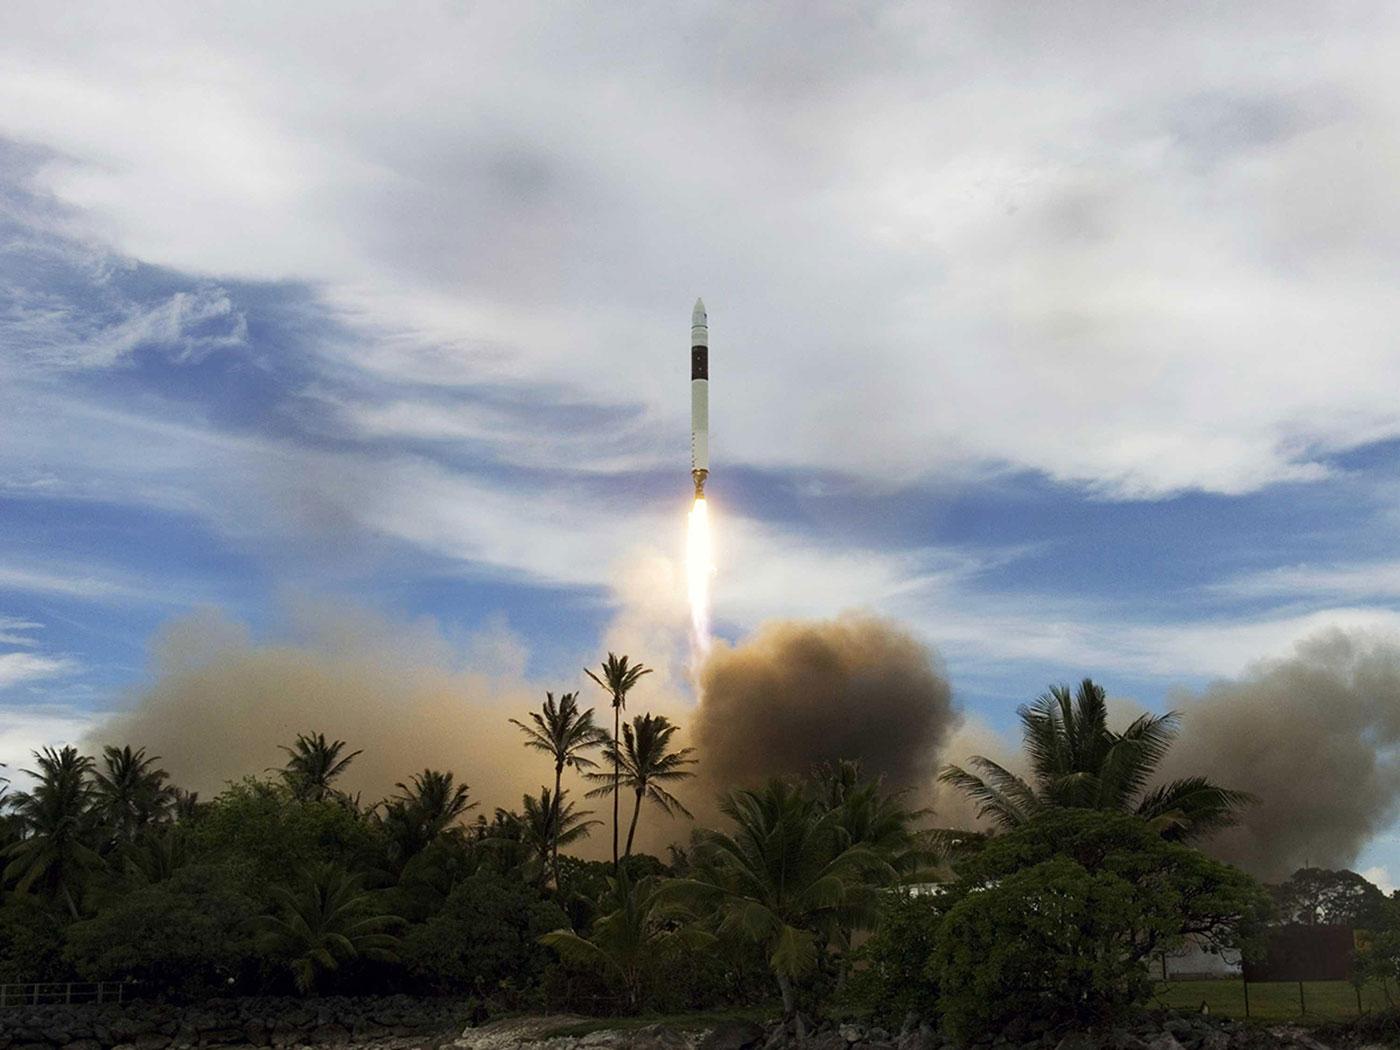 Elon Musk's Space Dream Almost Killed Tesla